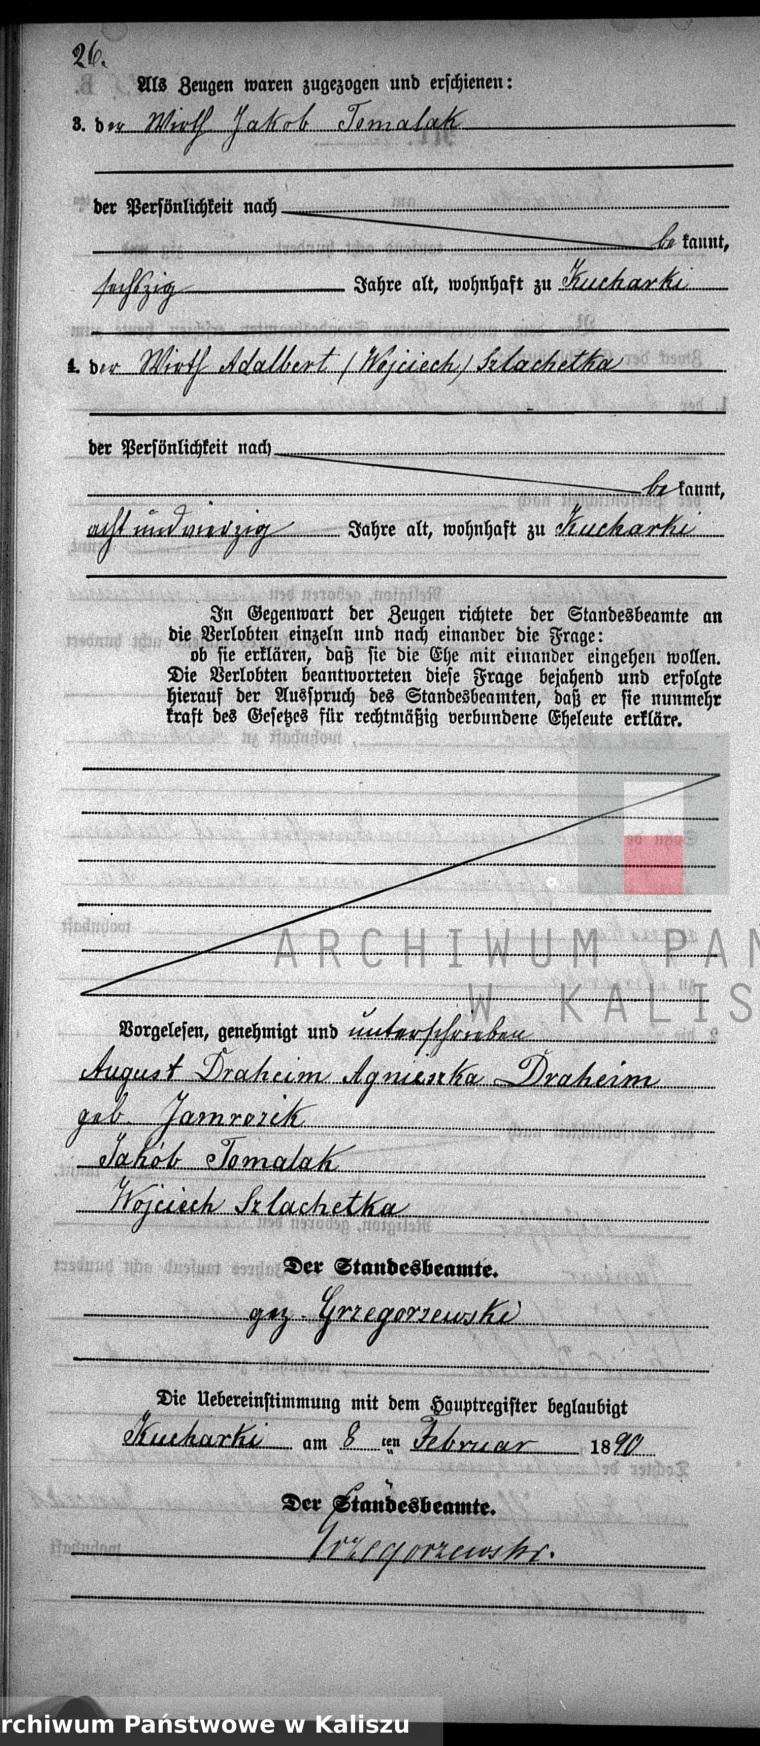 augustyn-draheim-and-agnieszka-jamrozik-1890-p-2